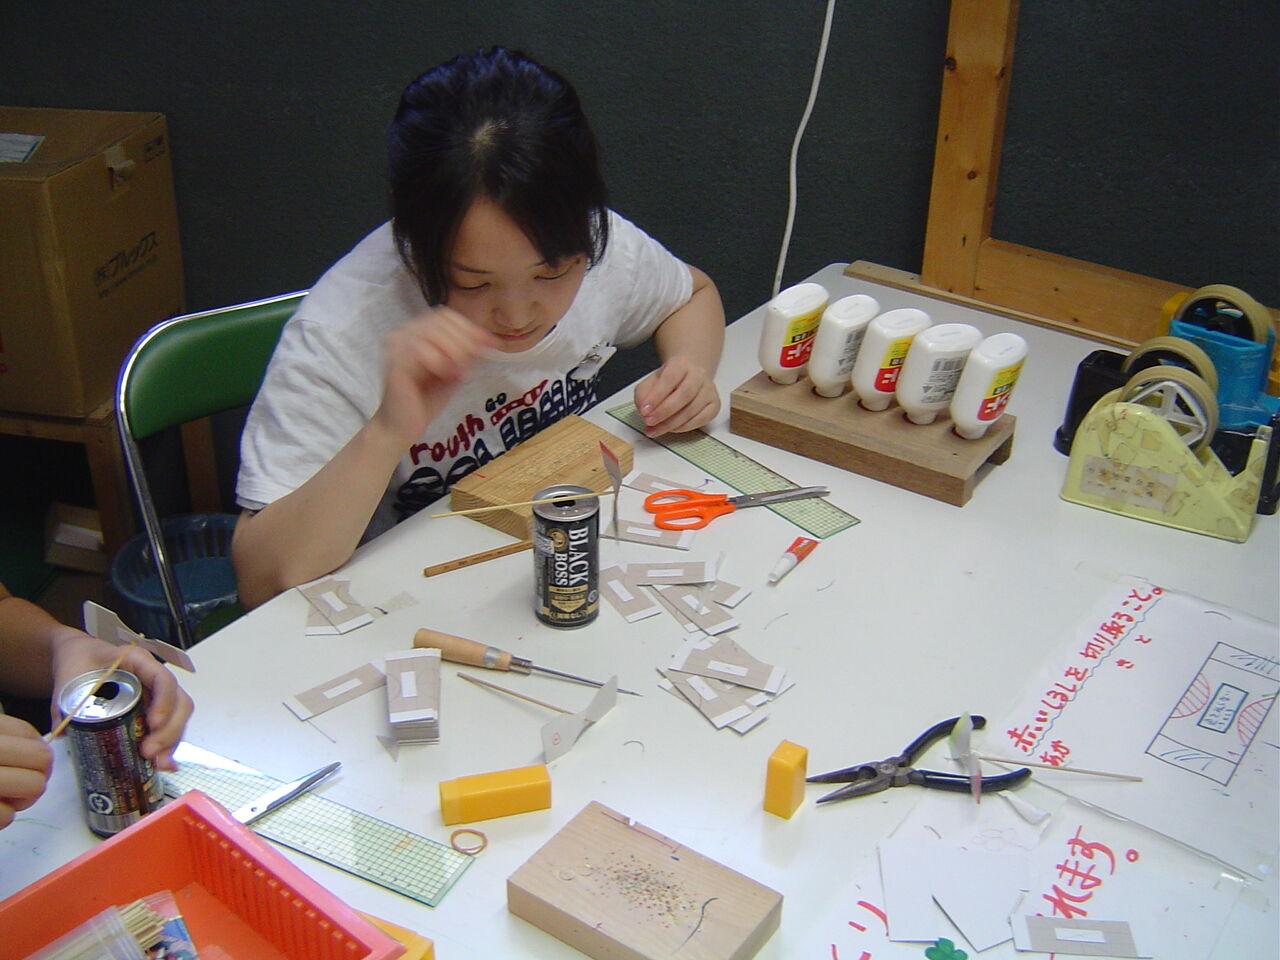 https://livedoor.blogimg.jp/ikouyou_1204/imgs/c/5/c5df5b80.jpg